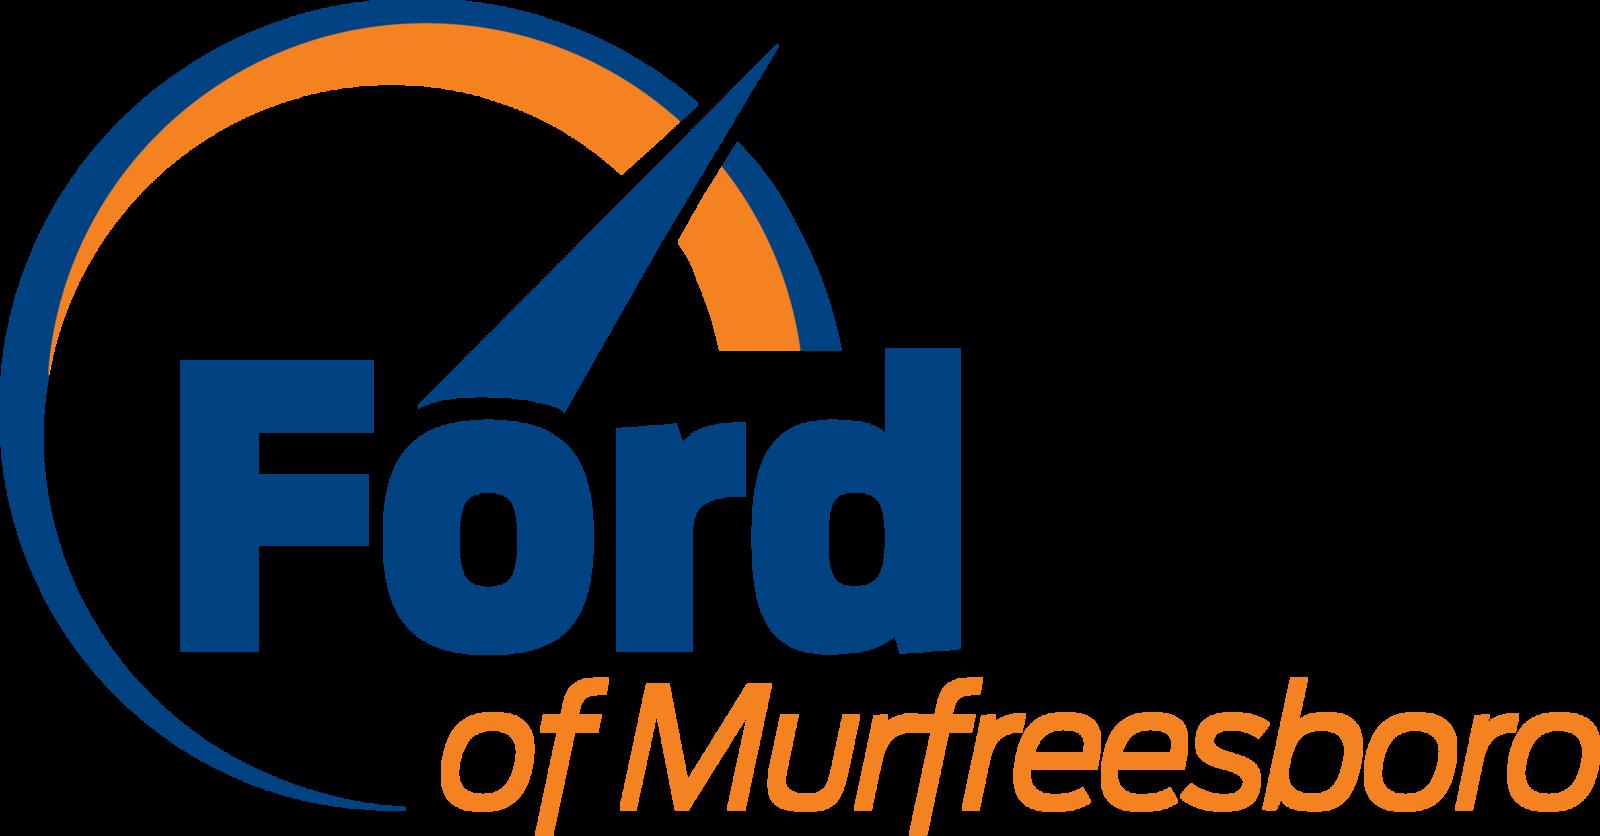 Ford of Murfreesboro - Murfreesboro, TN: Read Consumer ...   ford of murfreesboro